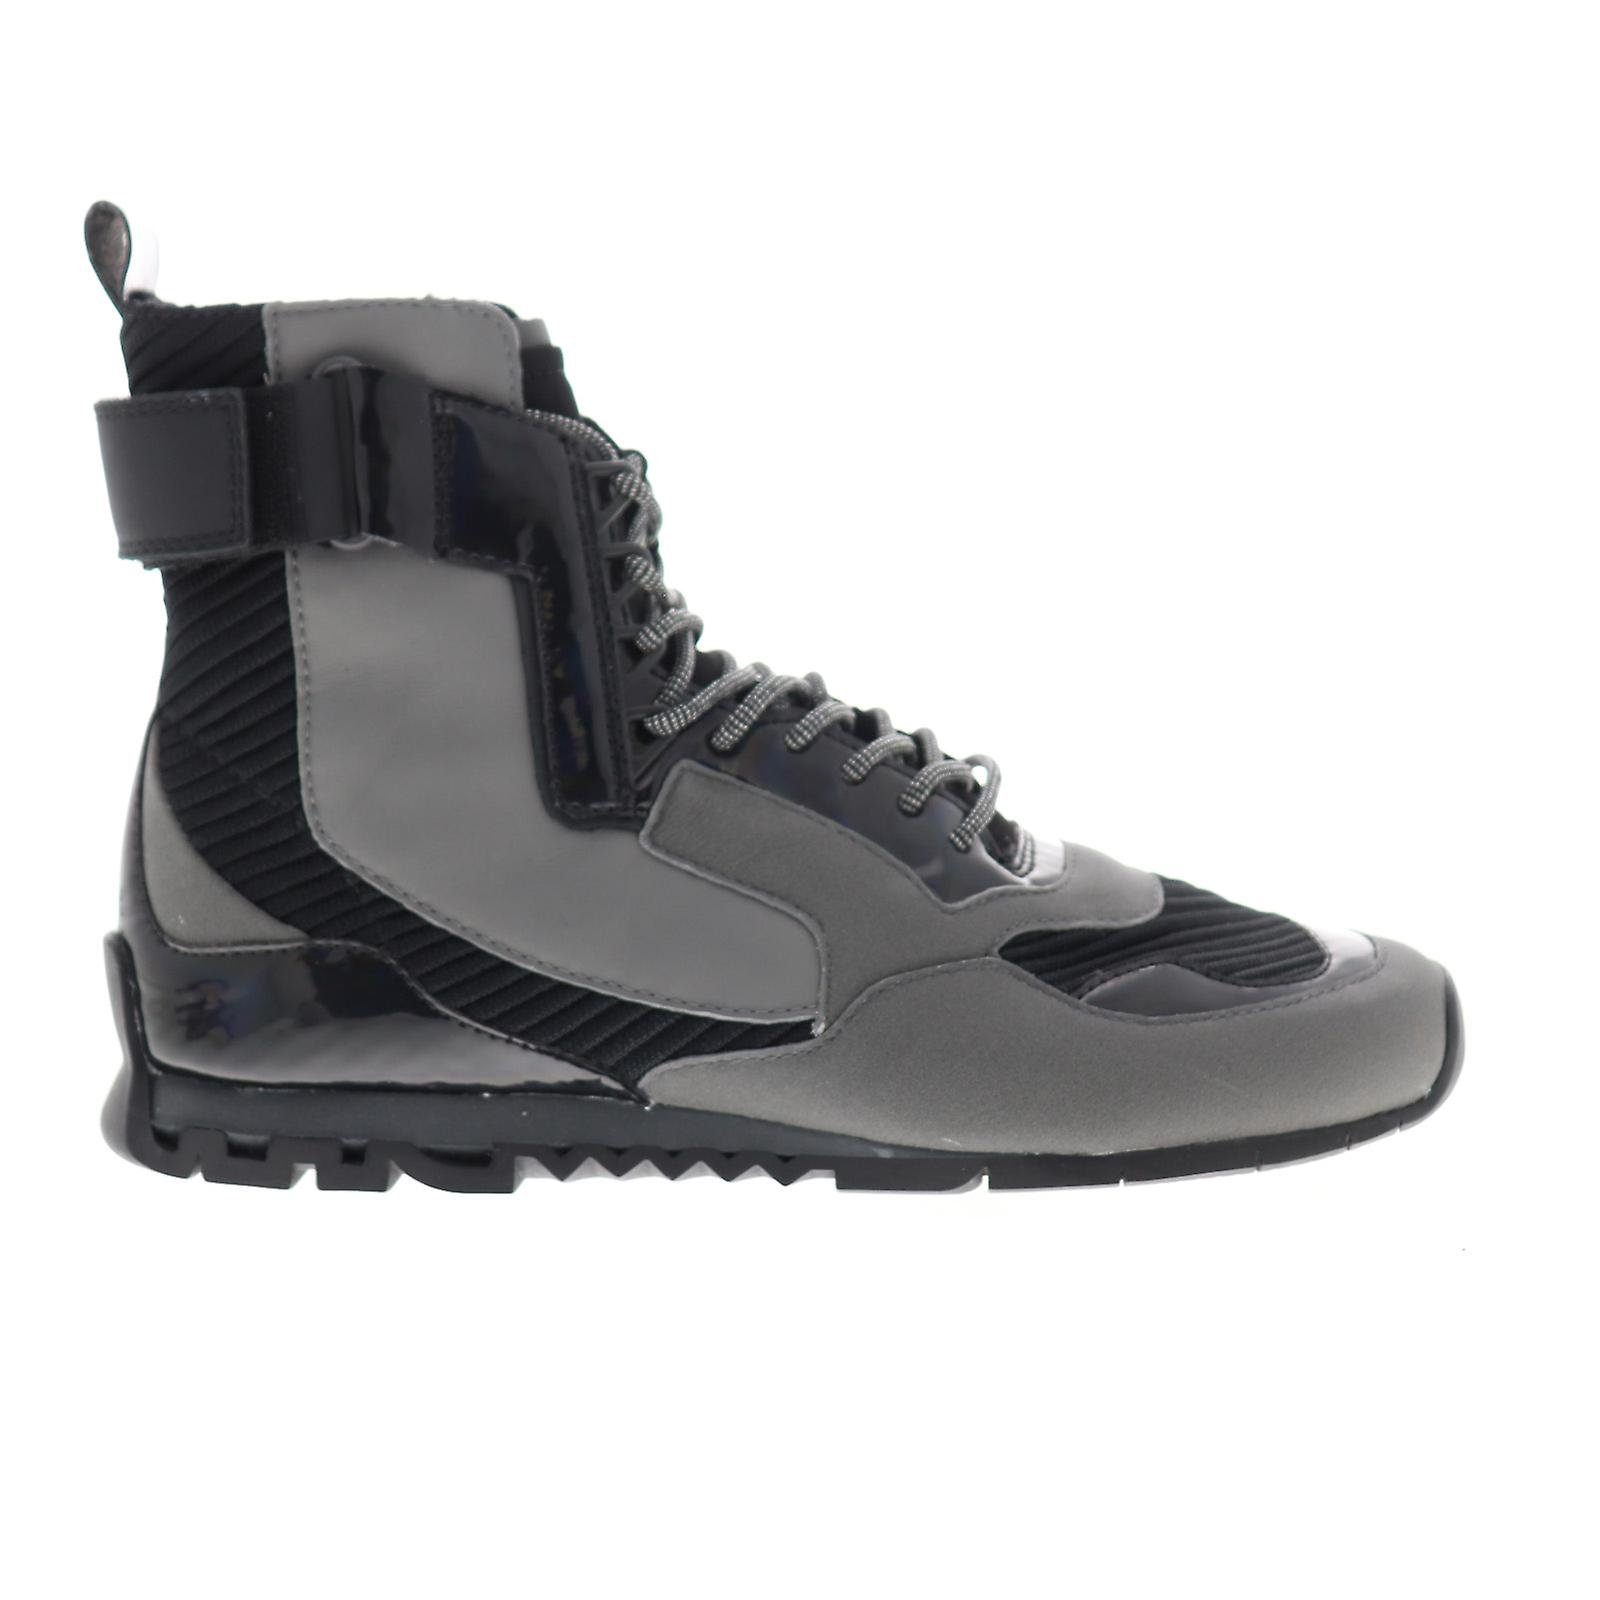 Camper Nothing Mens Gray Nubuck Cuir High Top Sneakers Chaussures